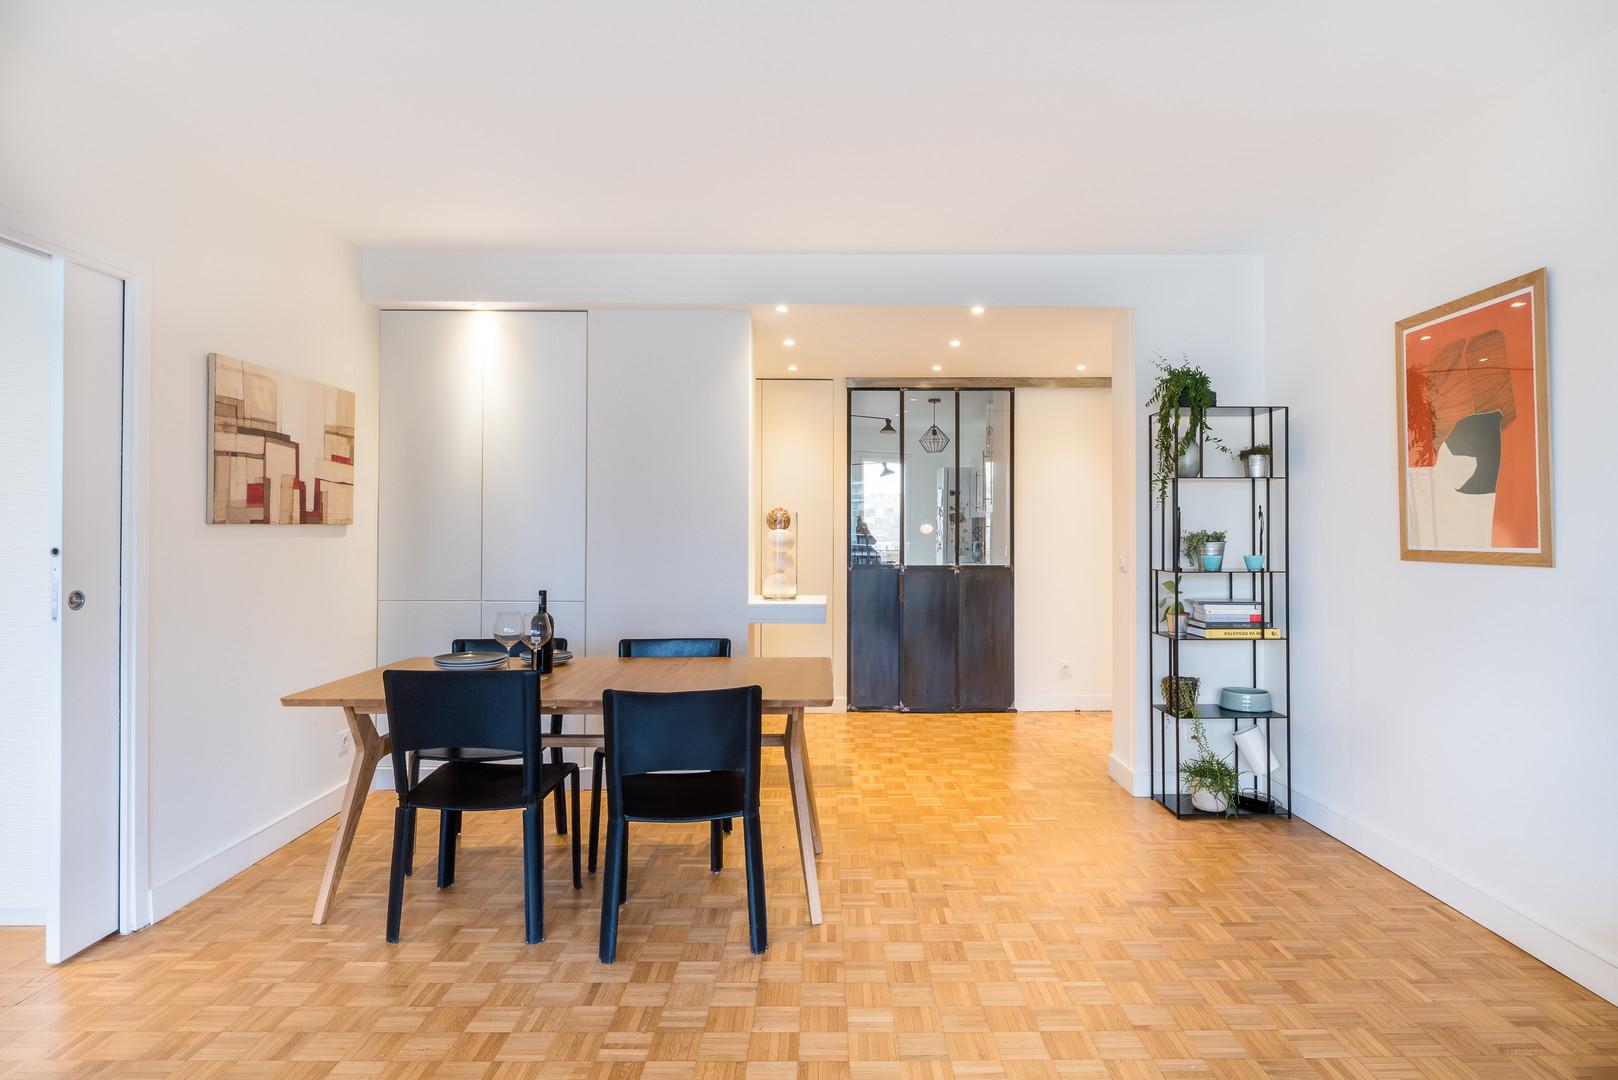 1_2017-12-14-Appartement Boulogne-12.jpg